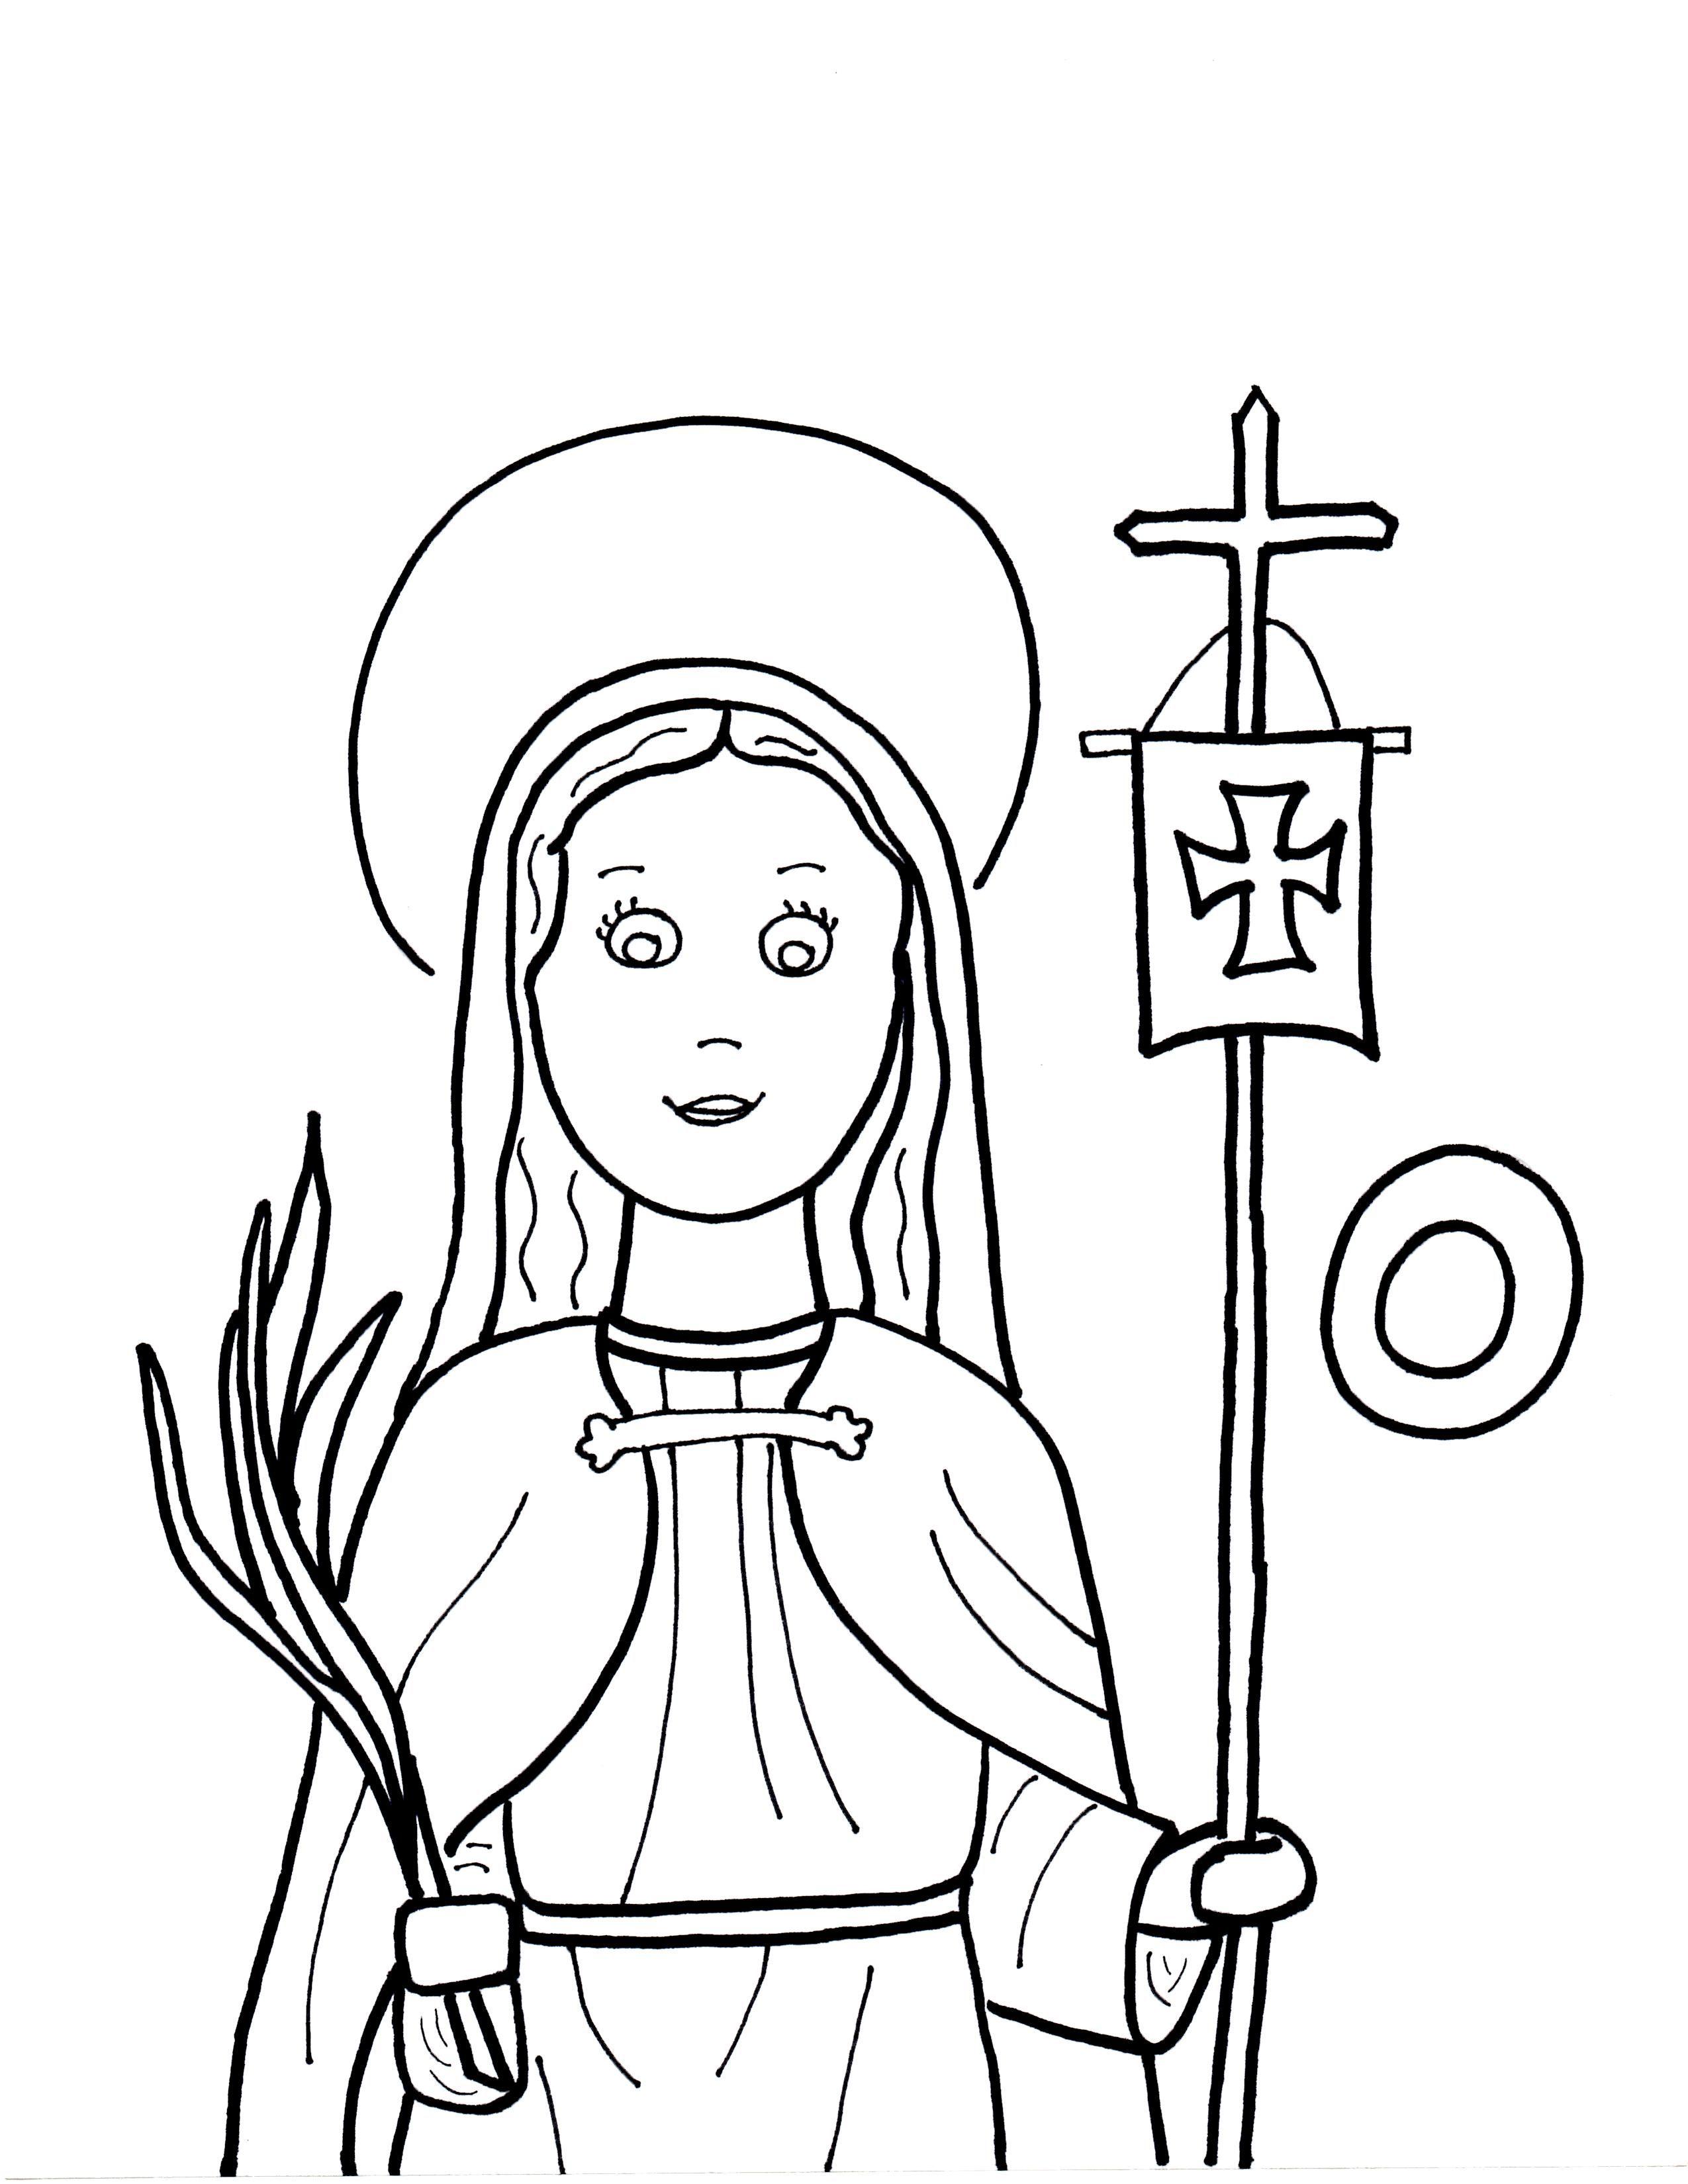 Week 15 4 20 16 Saint Odilia Coloring Sheet